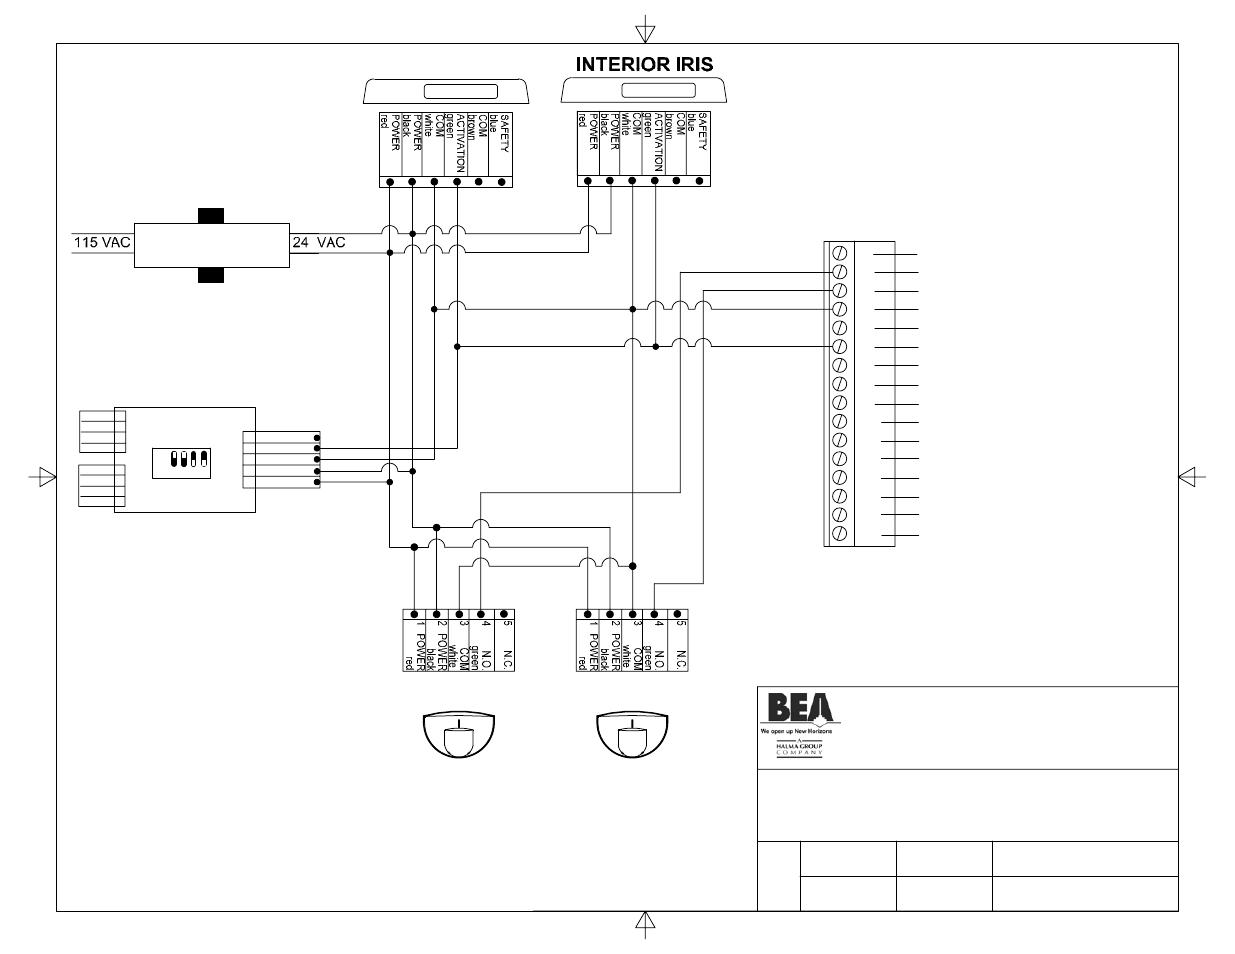 automatic door lock wiring diagram of the hand and wrist bones horton 36